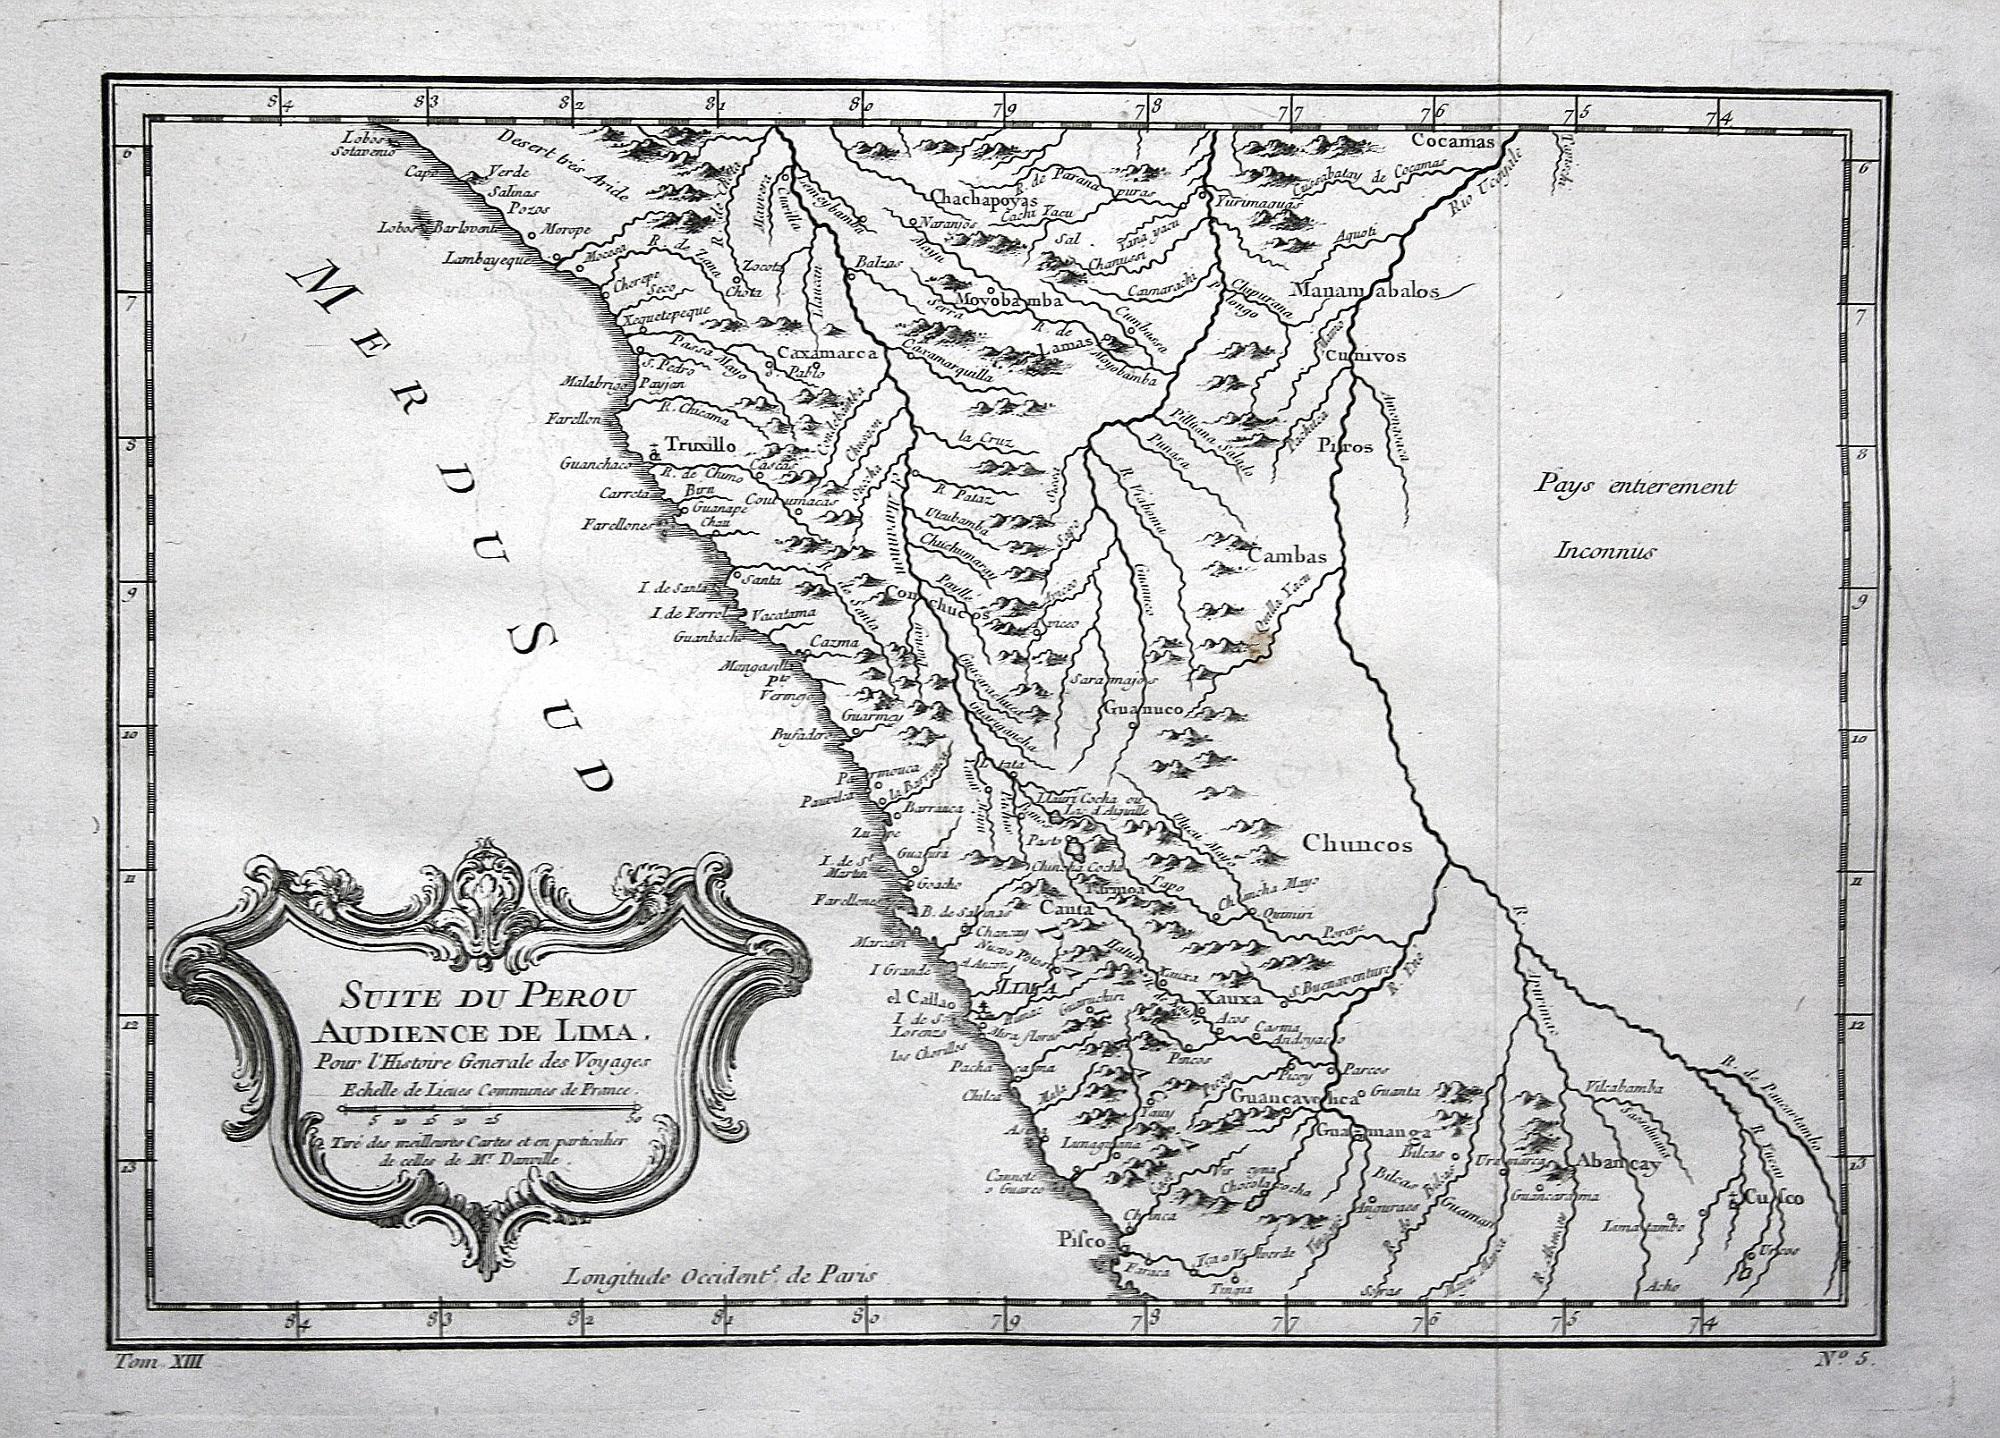 Peru Karte.Suite Du Perou Audience De Lima Peru Lima Trujillo Pisco Karte